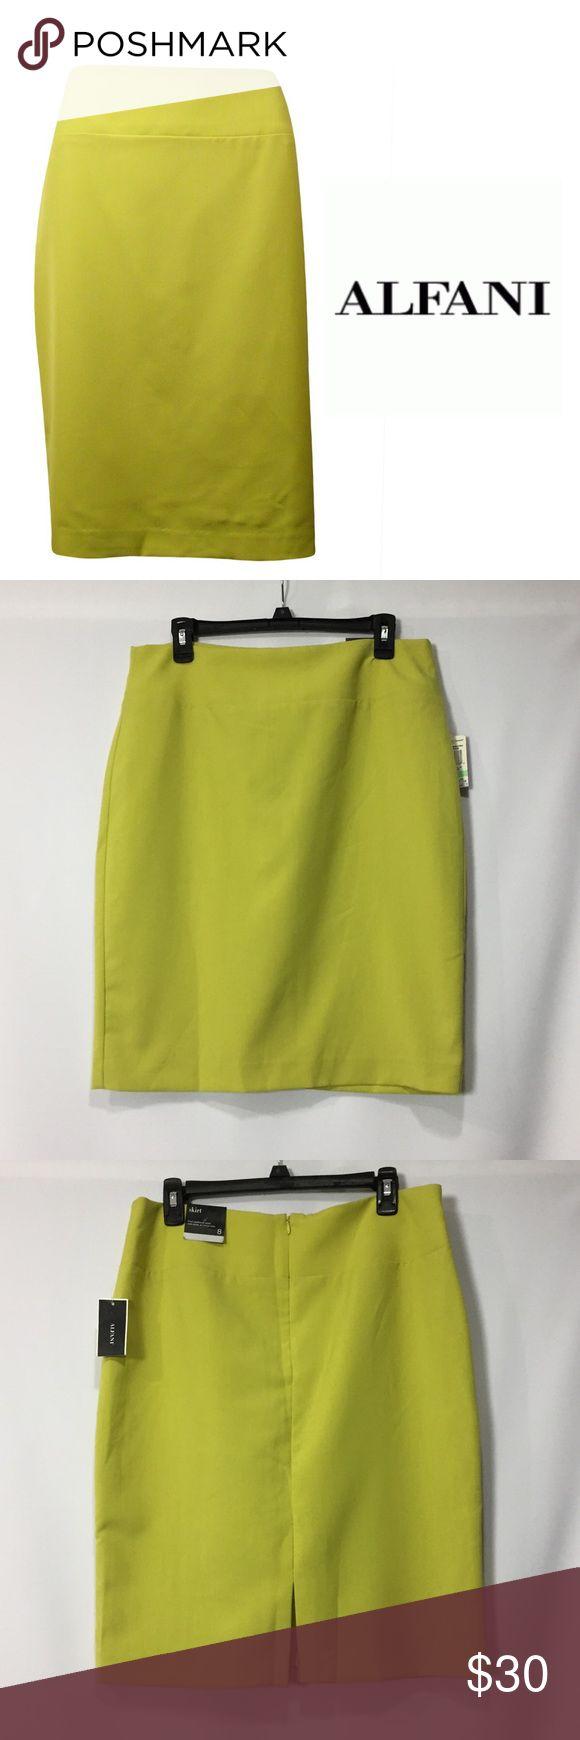 Alfani Lime Green Pencil Skirt Alfani new lime green pencil skirt. Feautures a polished finish with minimal stretch. Alfani Skirts